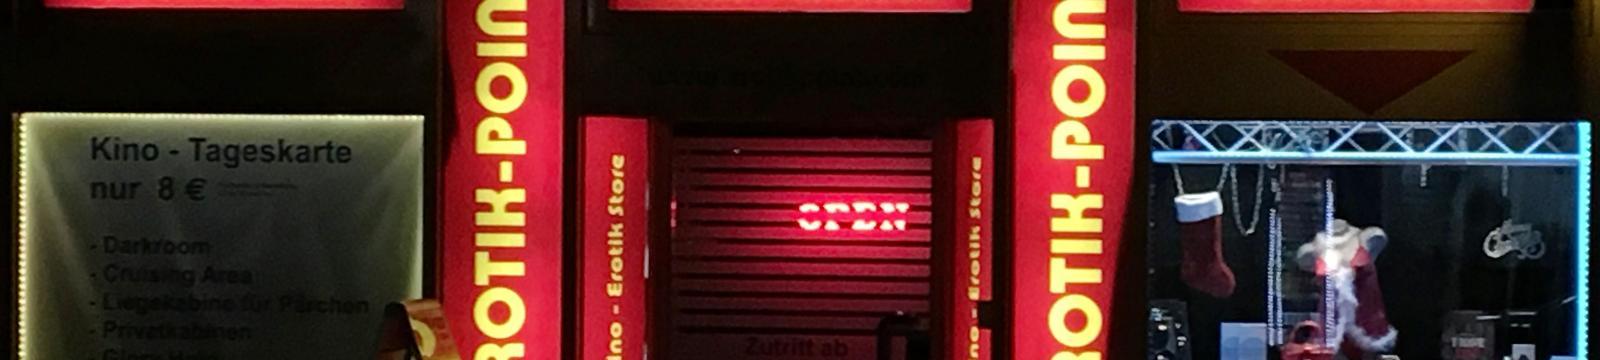 Erotik Shop Pforzheim